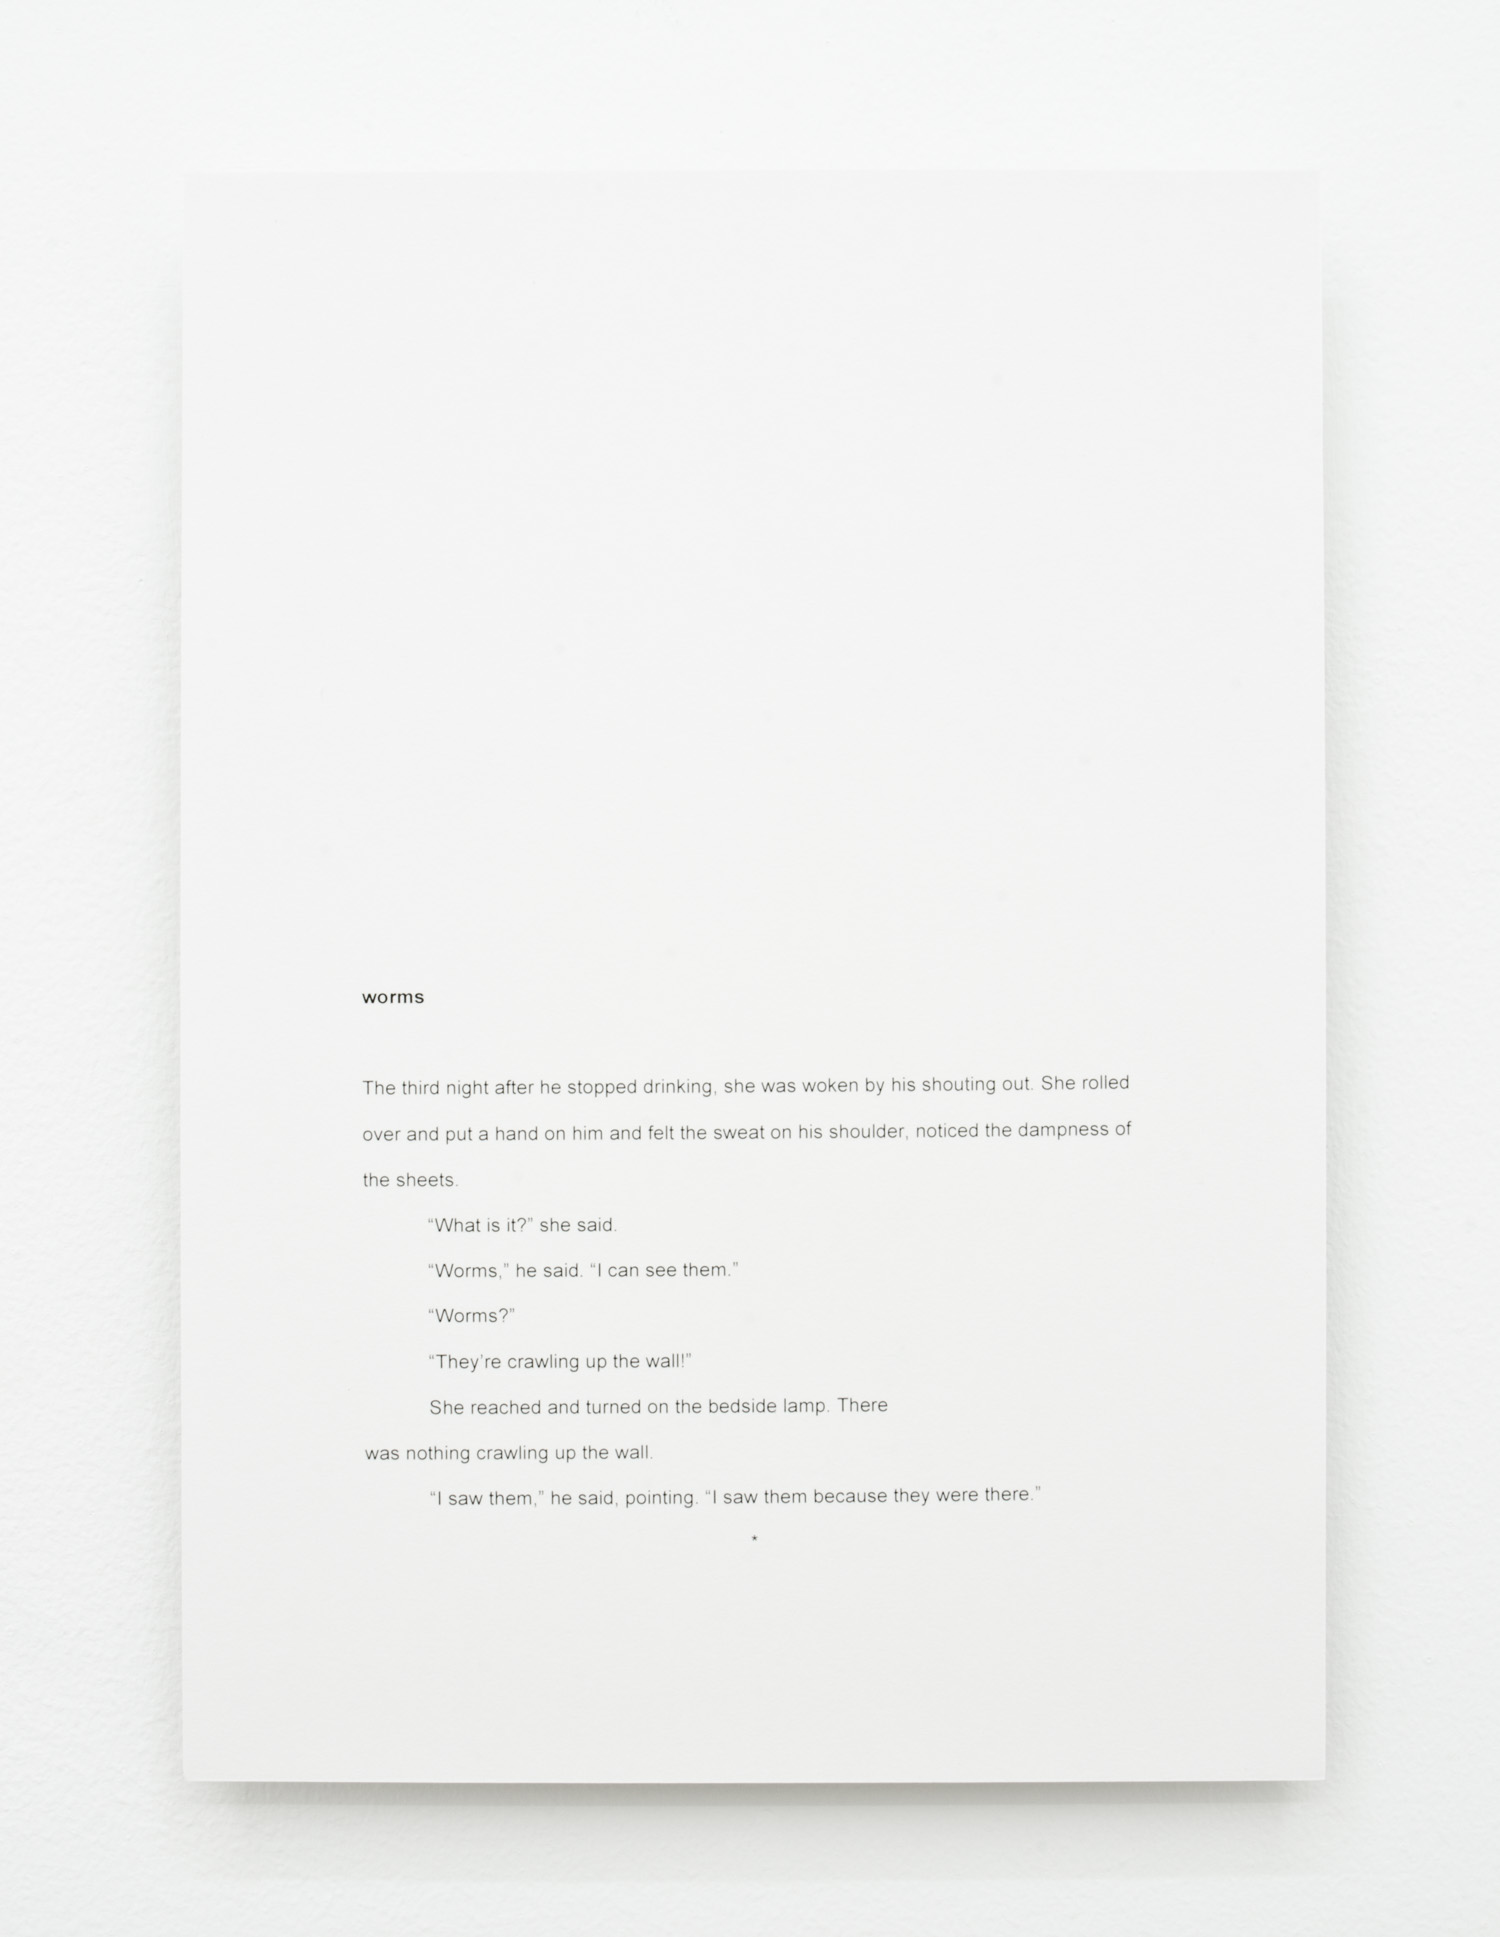 David L. Hayles, worms, 2014, laser print mounted on aluminium, 29.7 x 21cm.